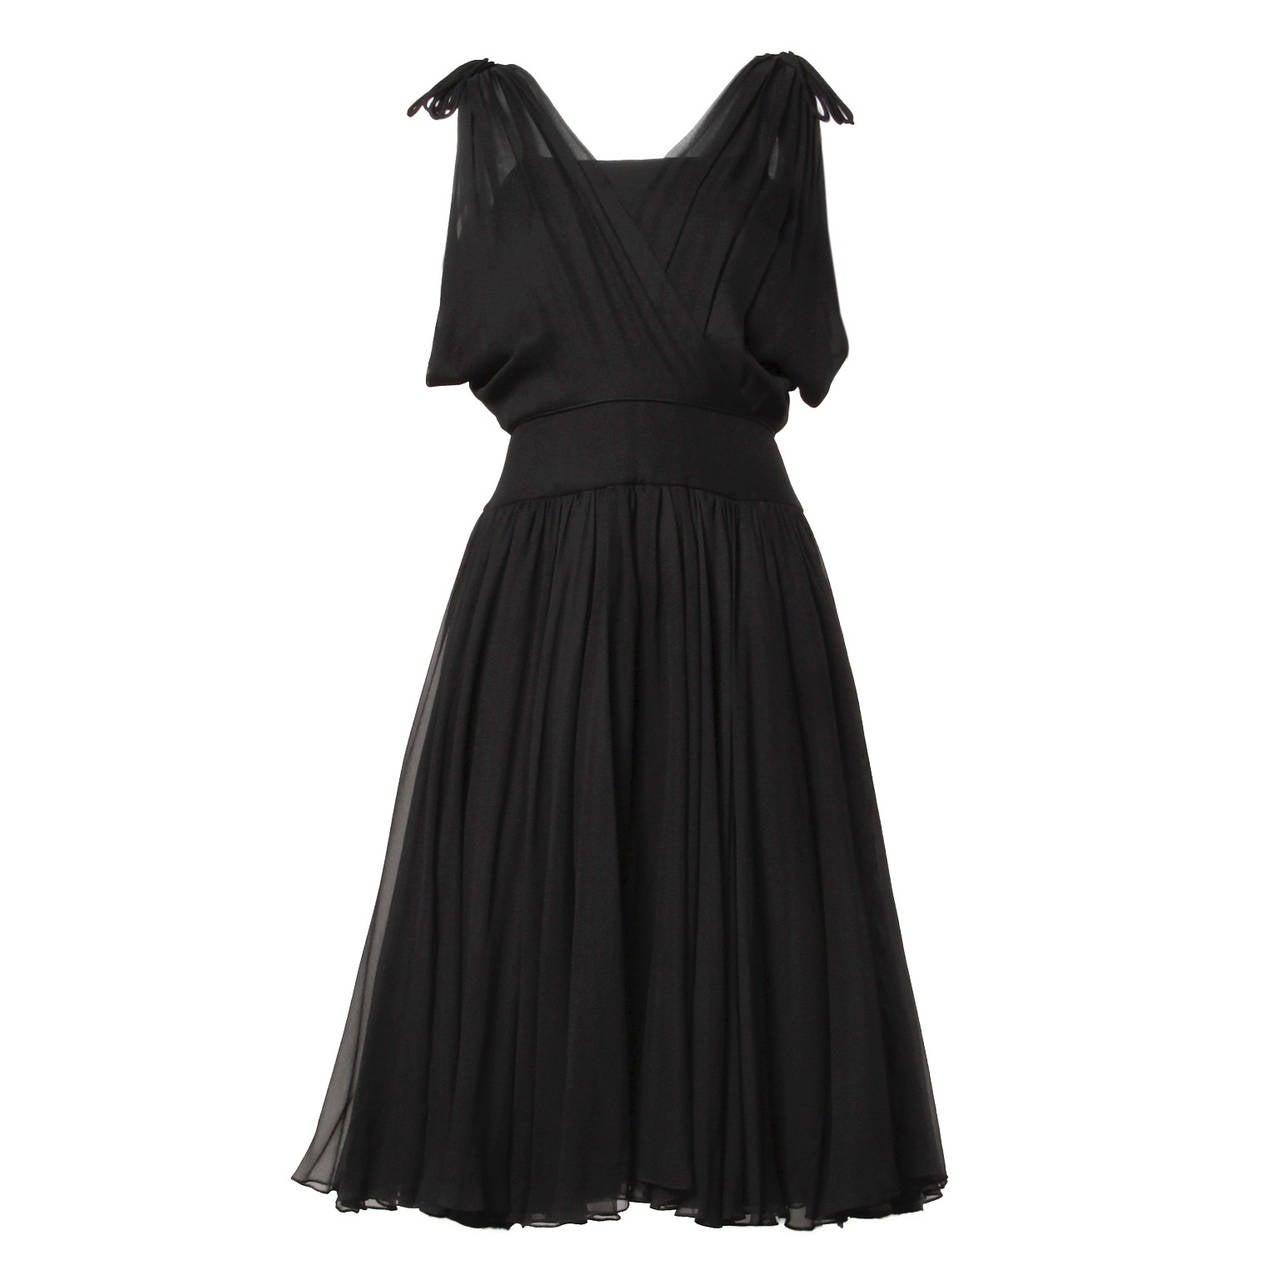 1950s Amazing Vintage Silk Chiffon Full Circle Cocktail Dress